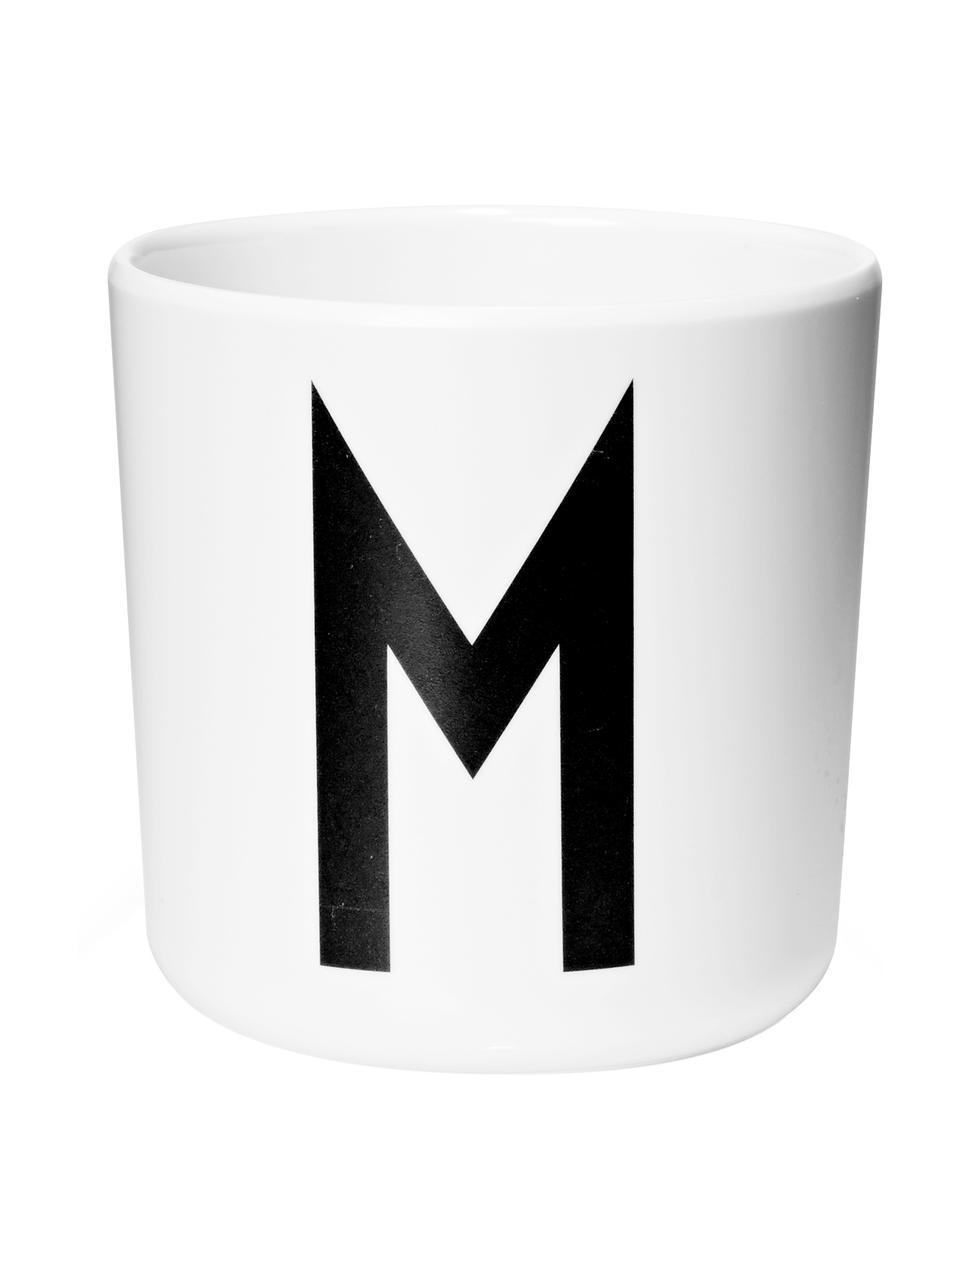 Mug pour enfantAlphabet (variantes deA à Z), Blanc, noir